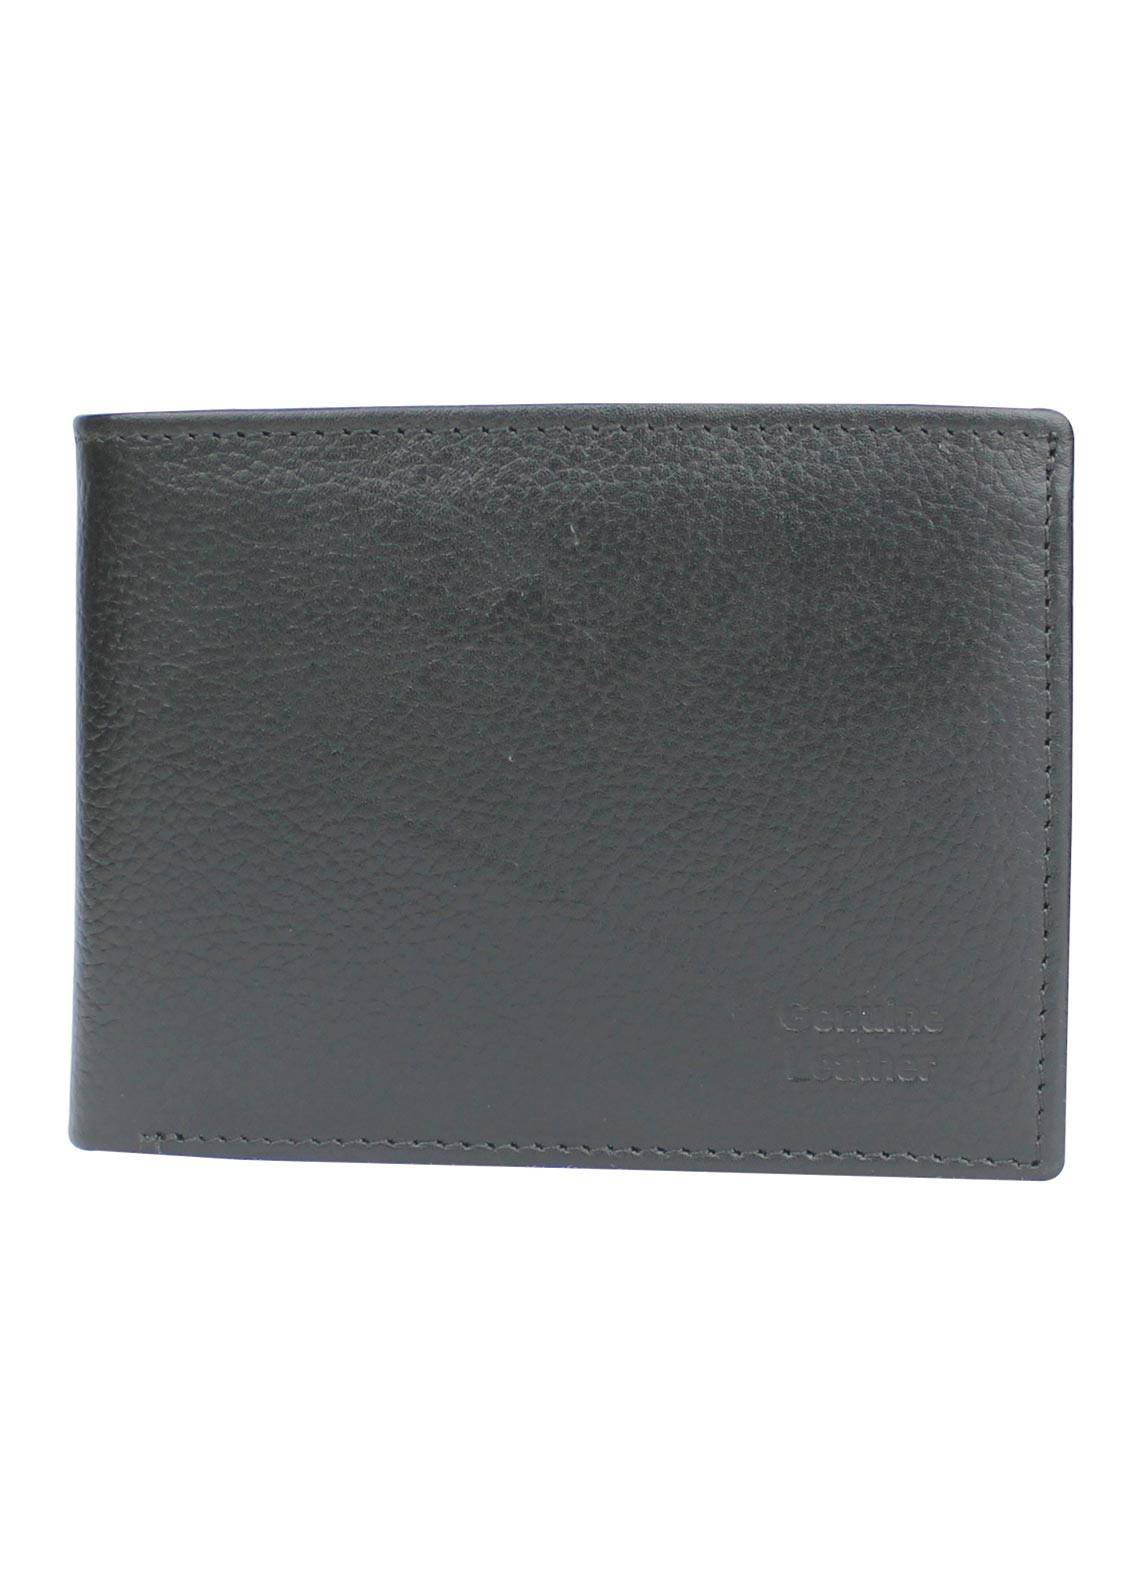 Shahzeb Saeed Plain Texture Leather  Wallet W-071 - Men's Accessories